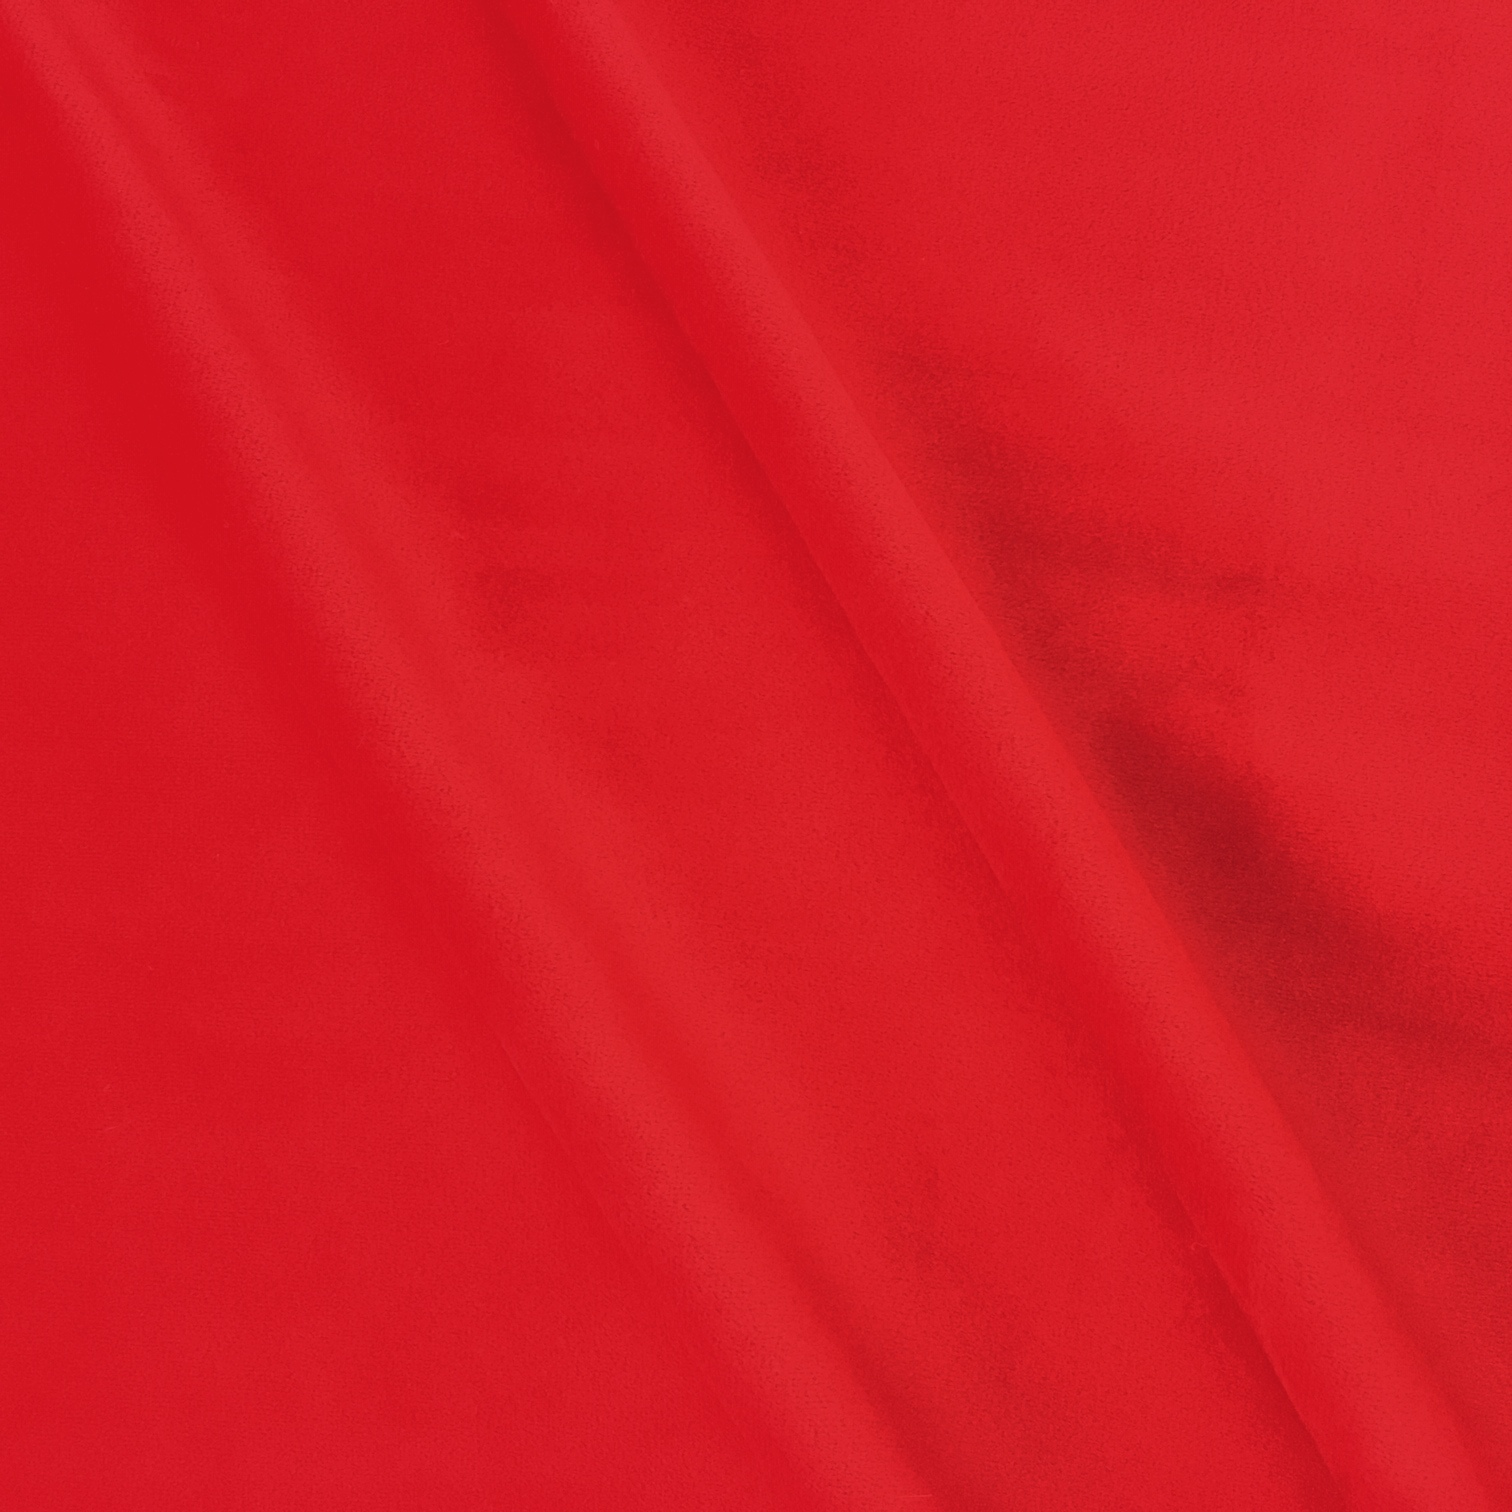 Red Premium Velvet Fabric Red Upholstery Fabric